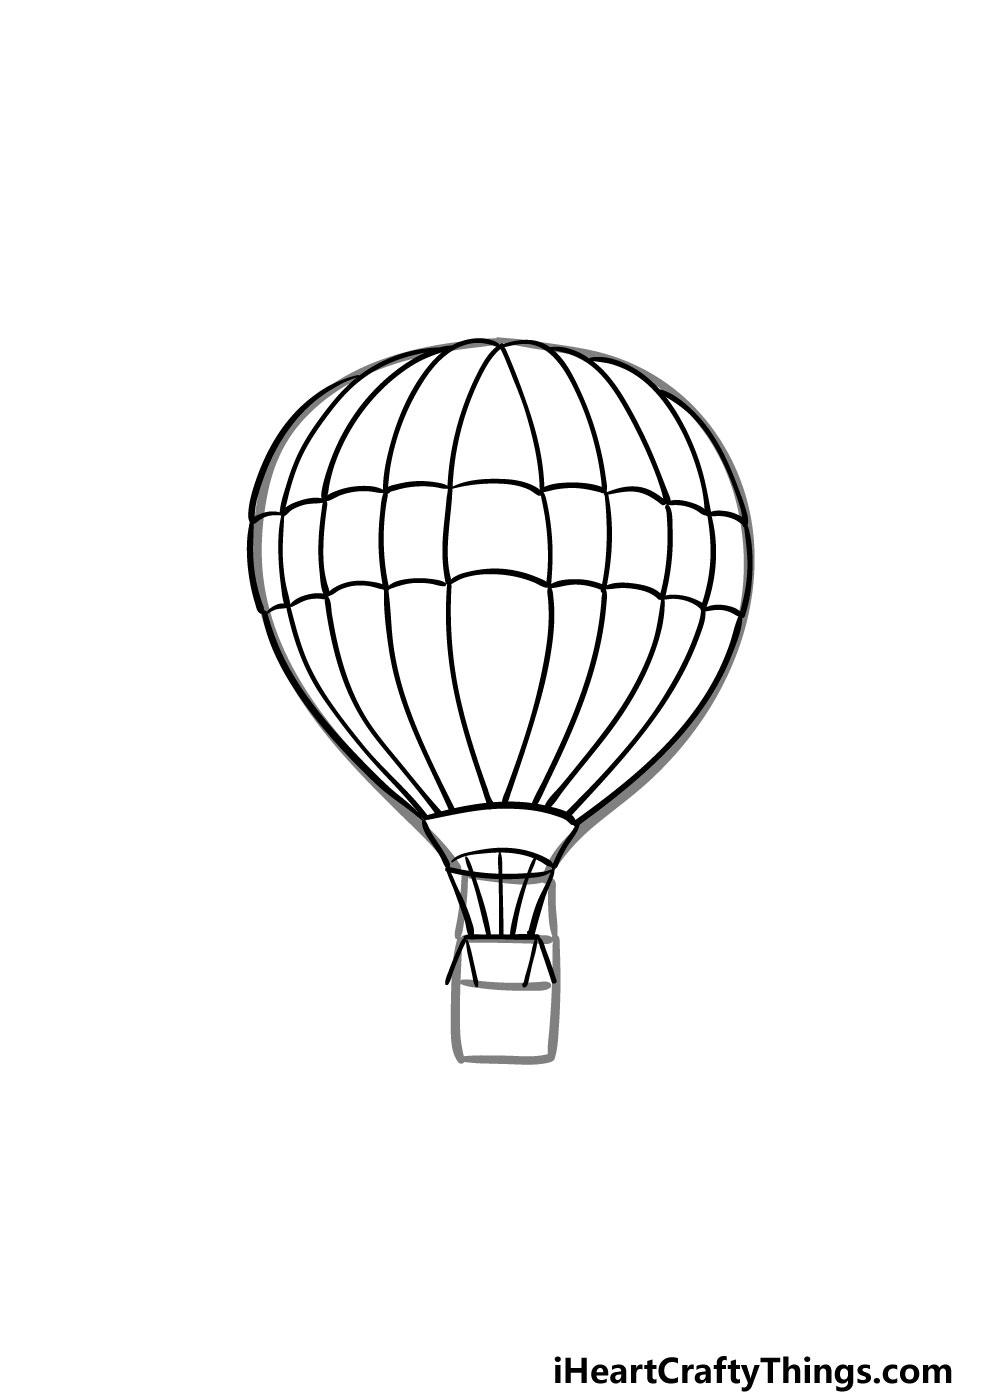 drawing a hot air balloon step 5